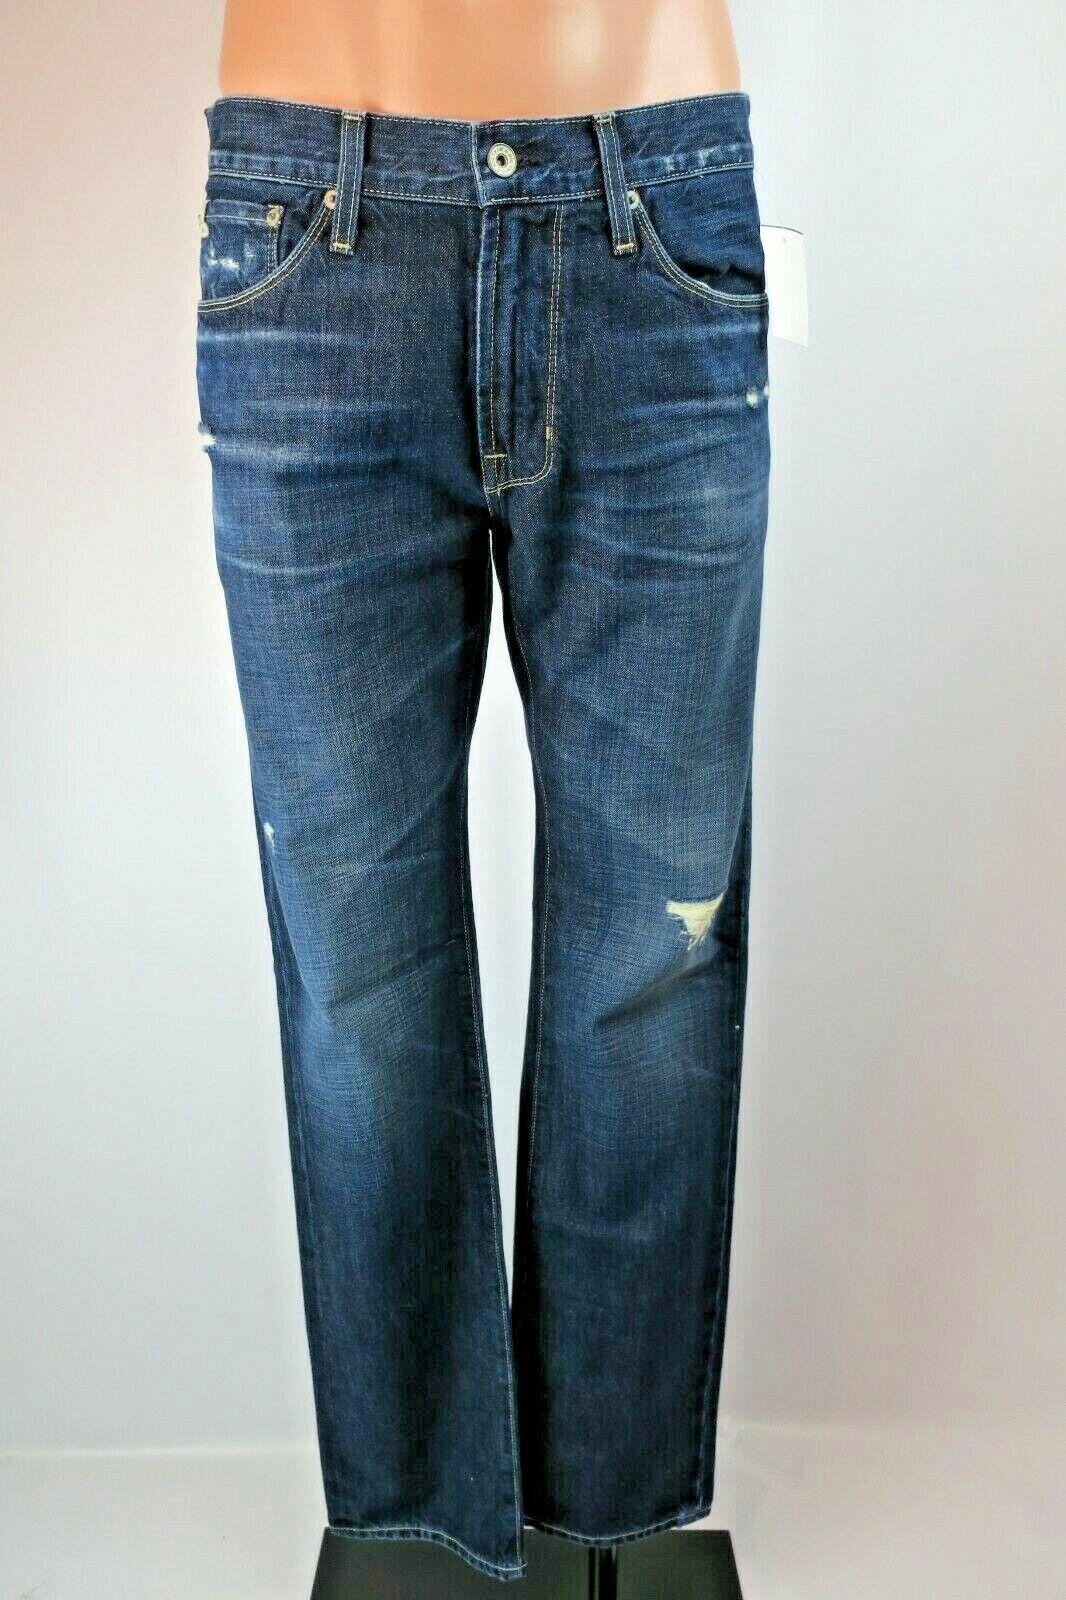 BIG STAR Division Straight Jeans Men SAMPLES 34x34 Distressed Denim Wash NWT NEW